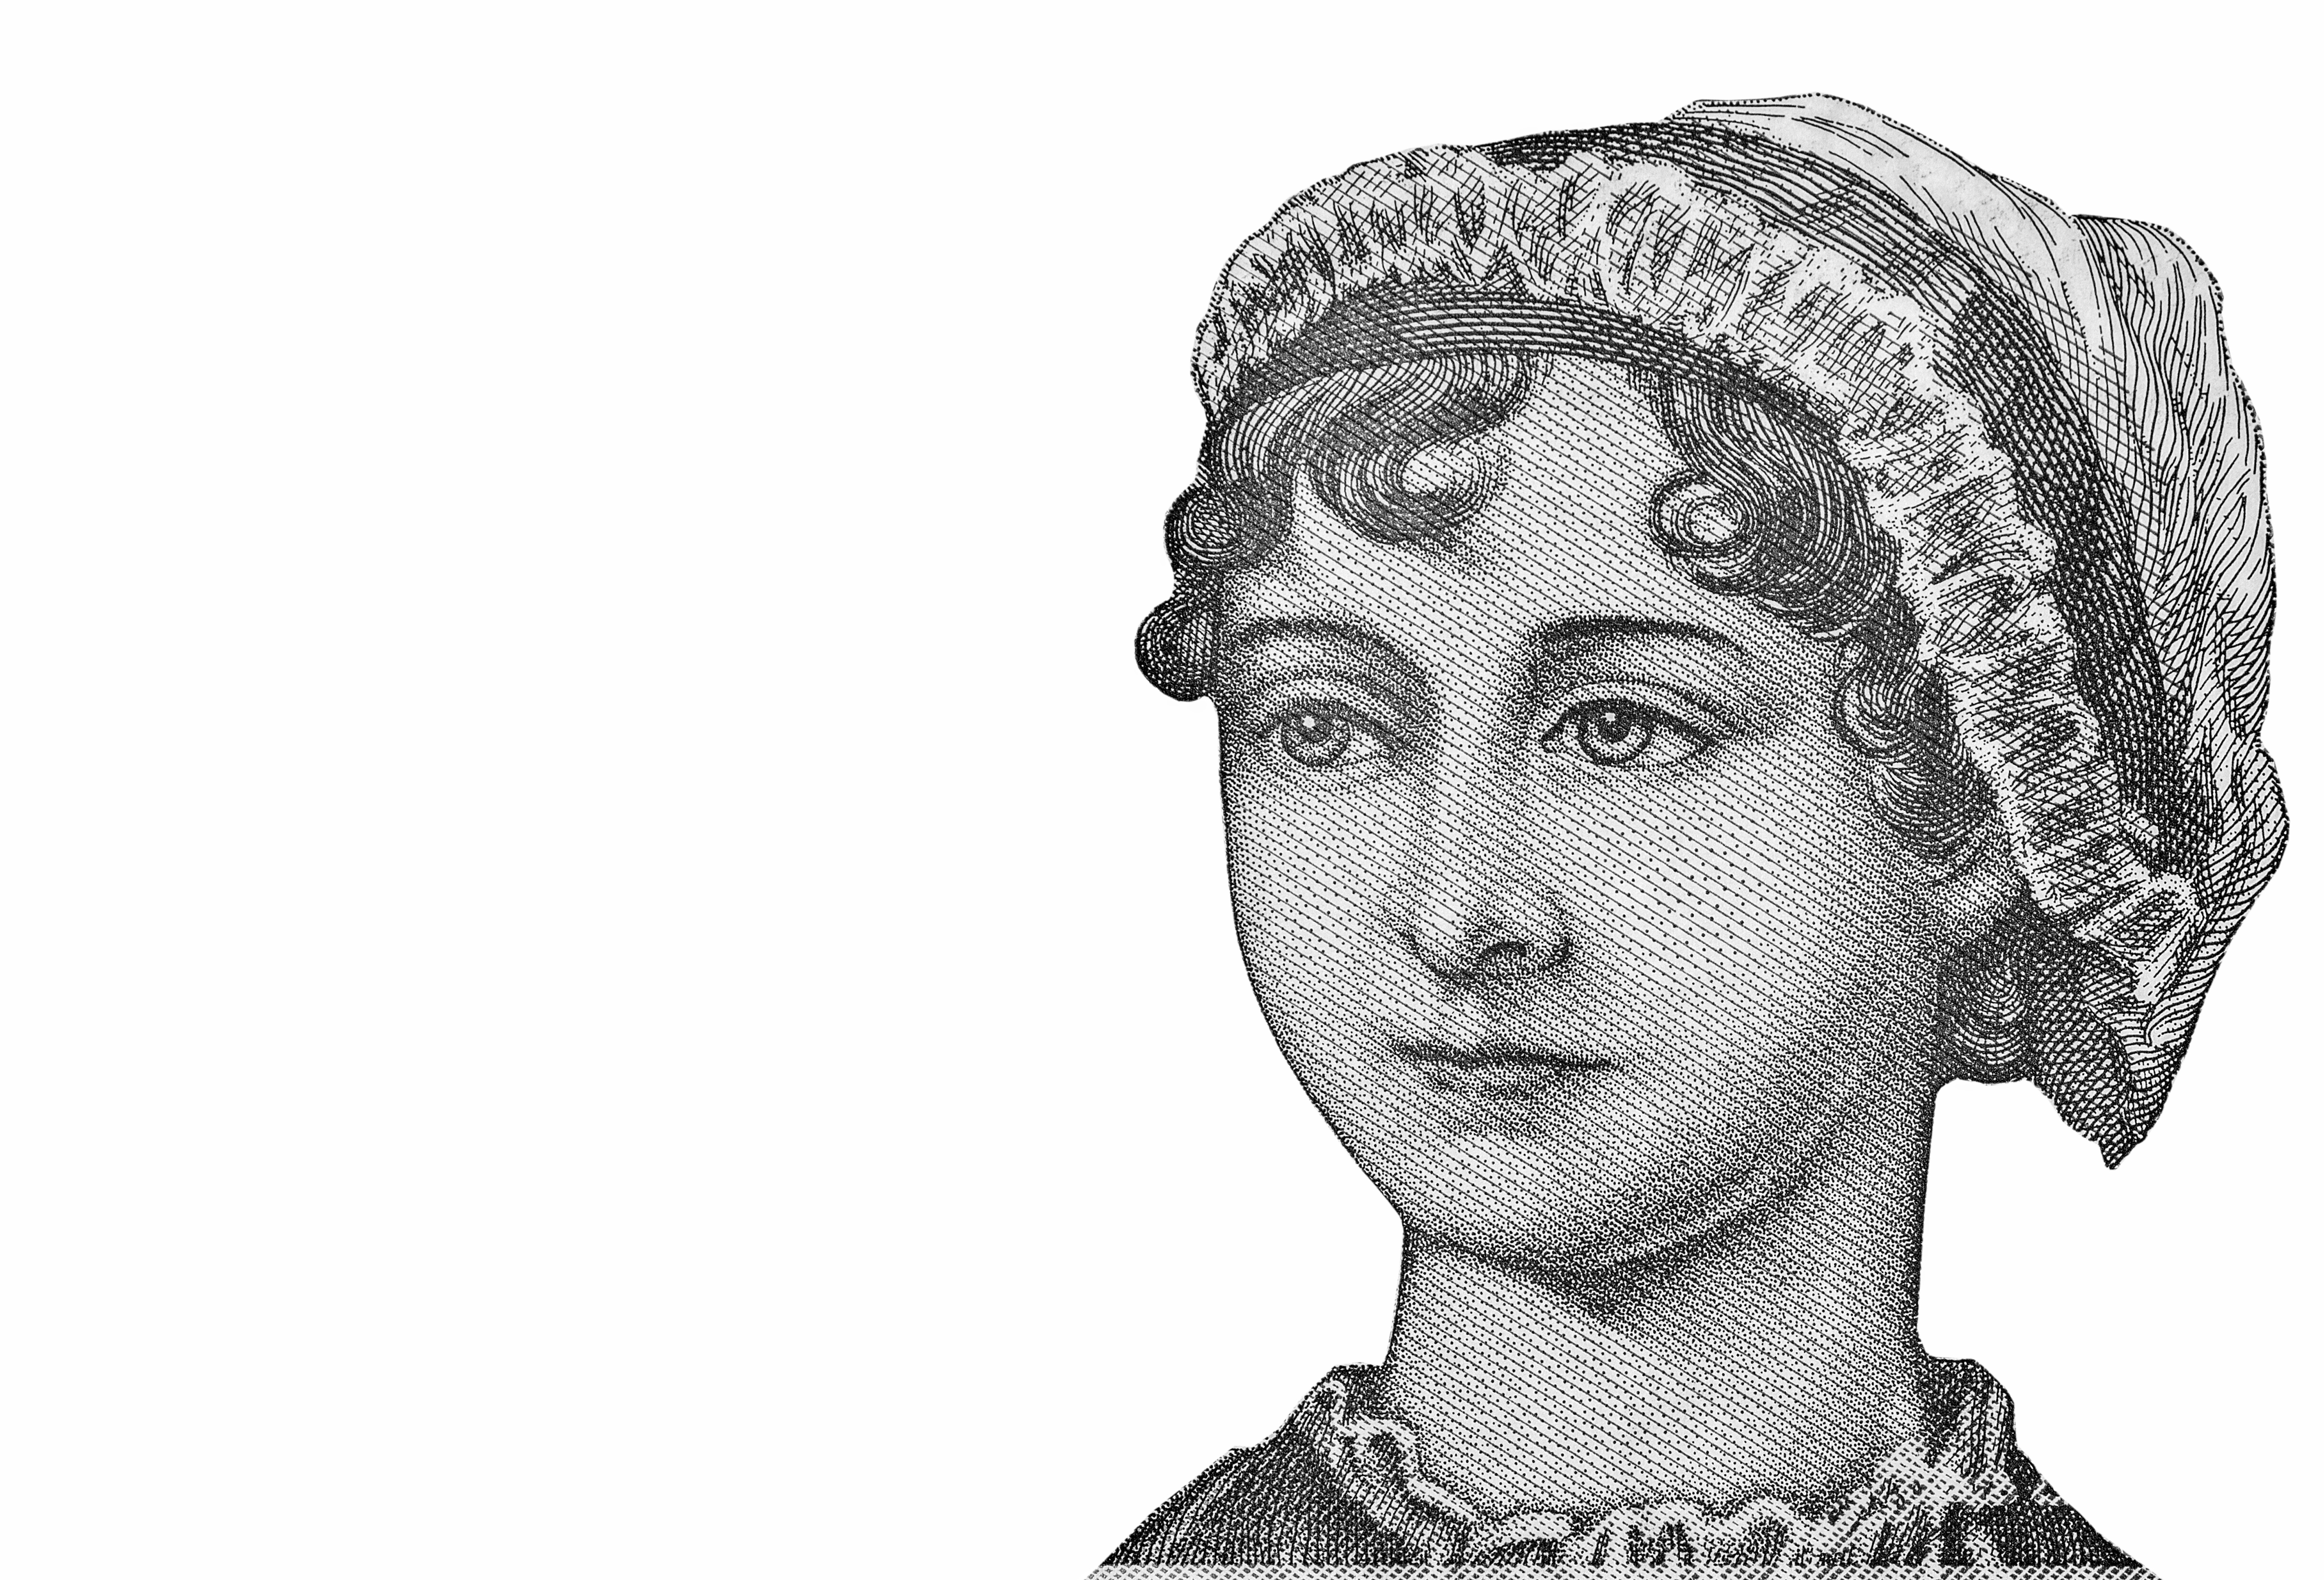 Jane Austen: dead or alive